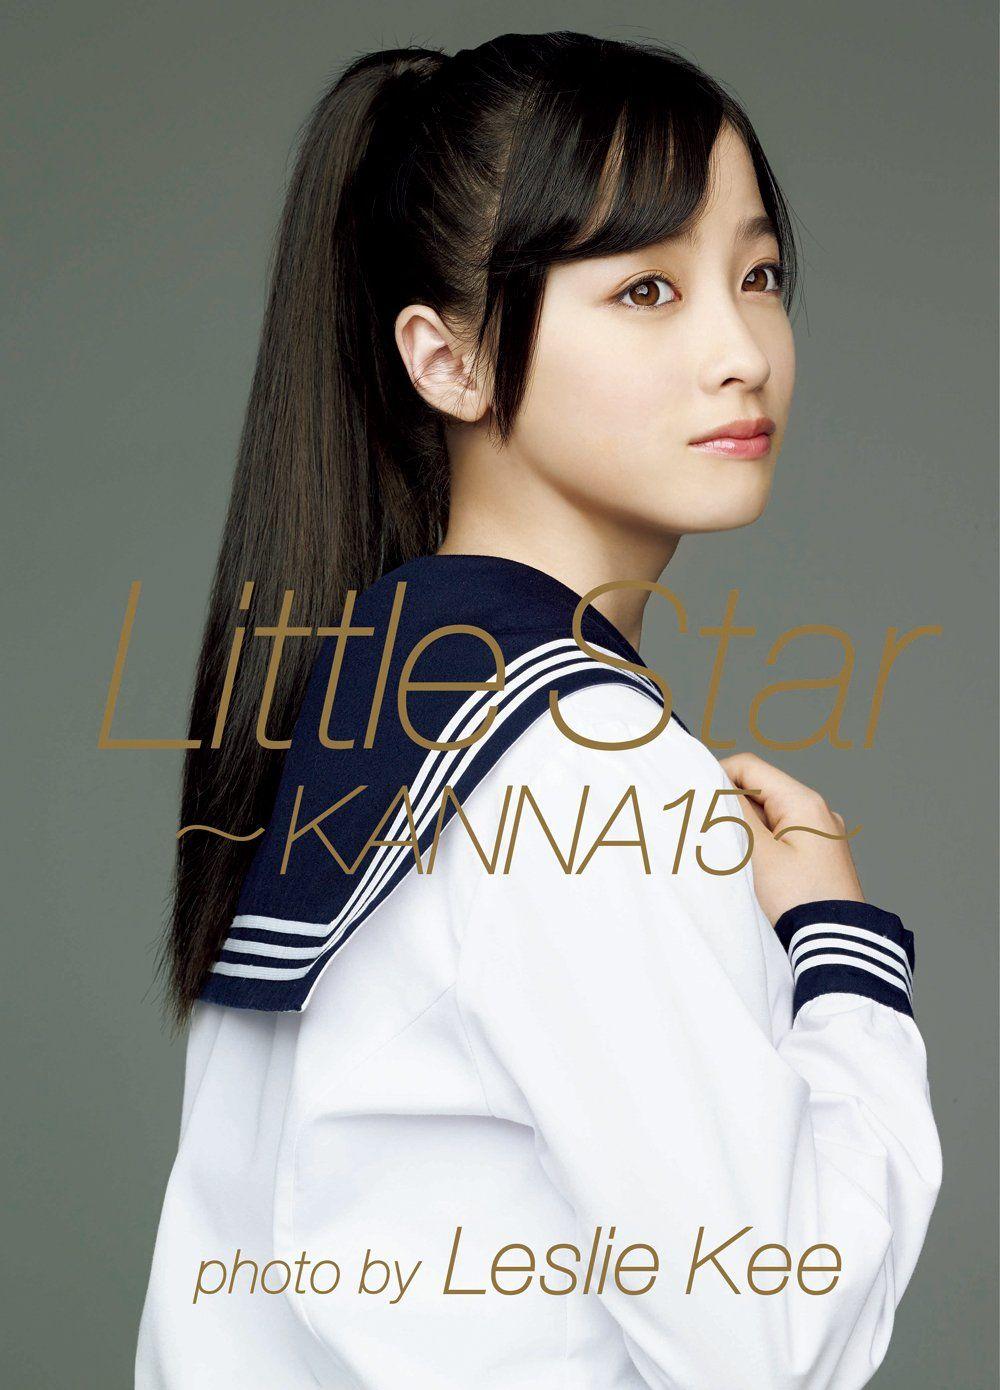 Image result for 橋本環奈 Little Star 〜KANNA15〜